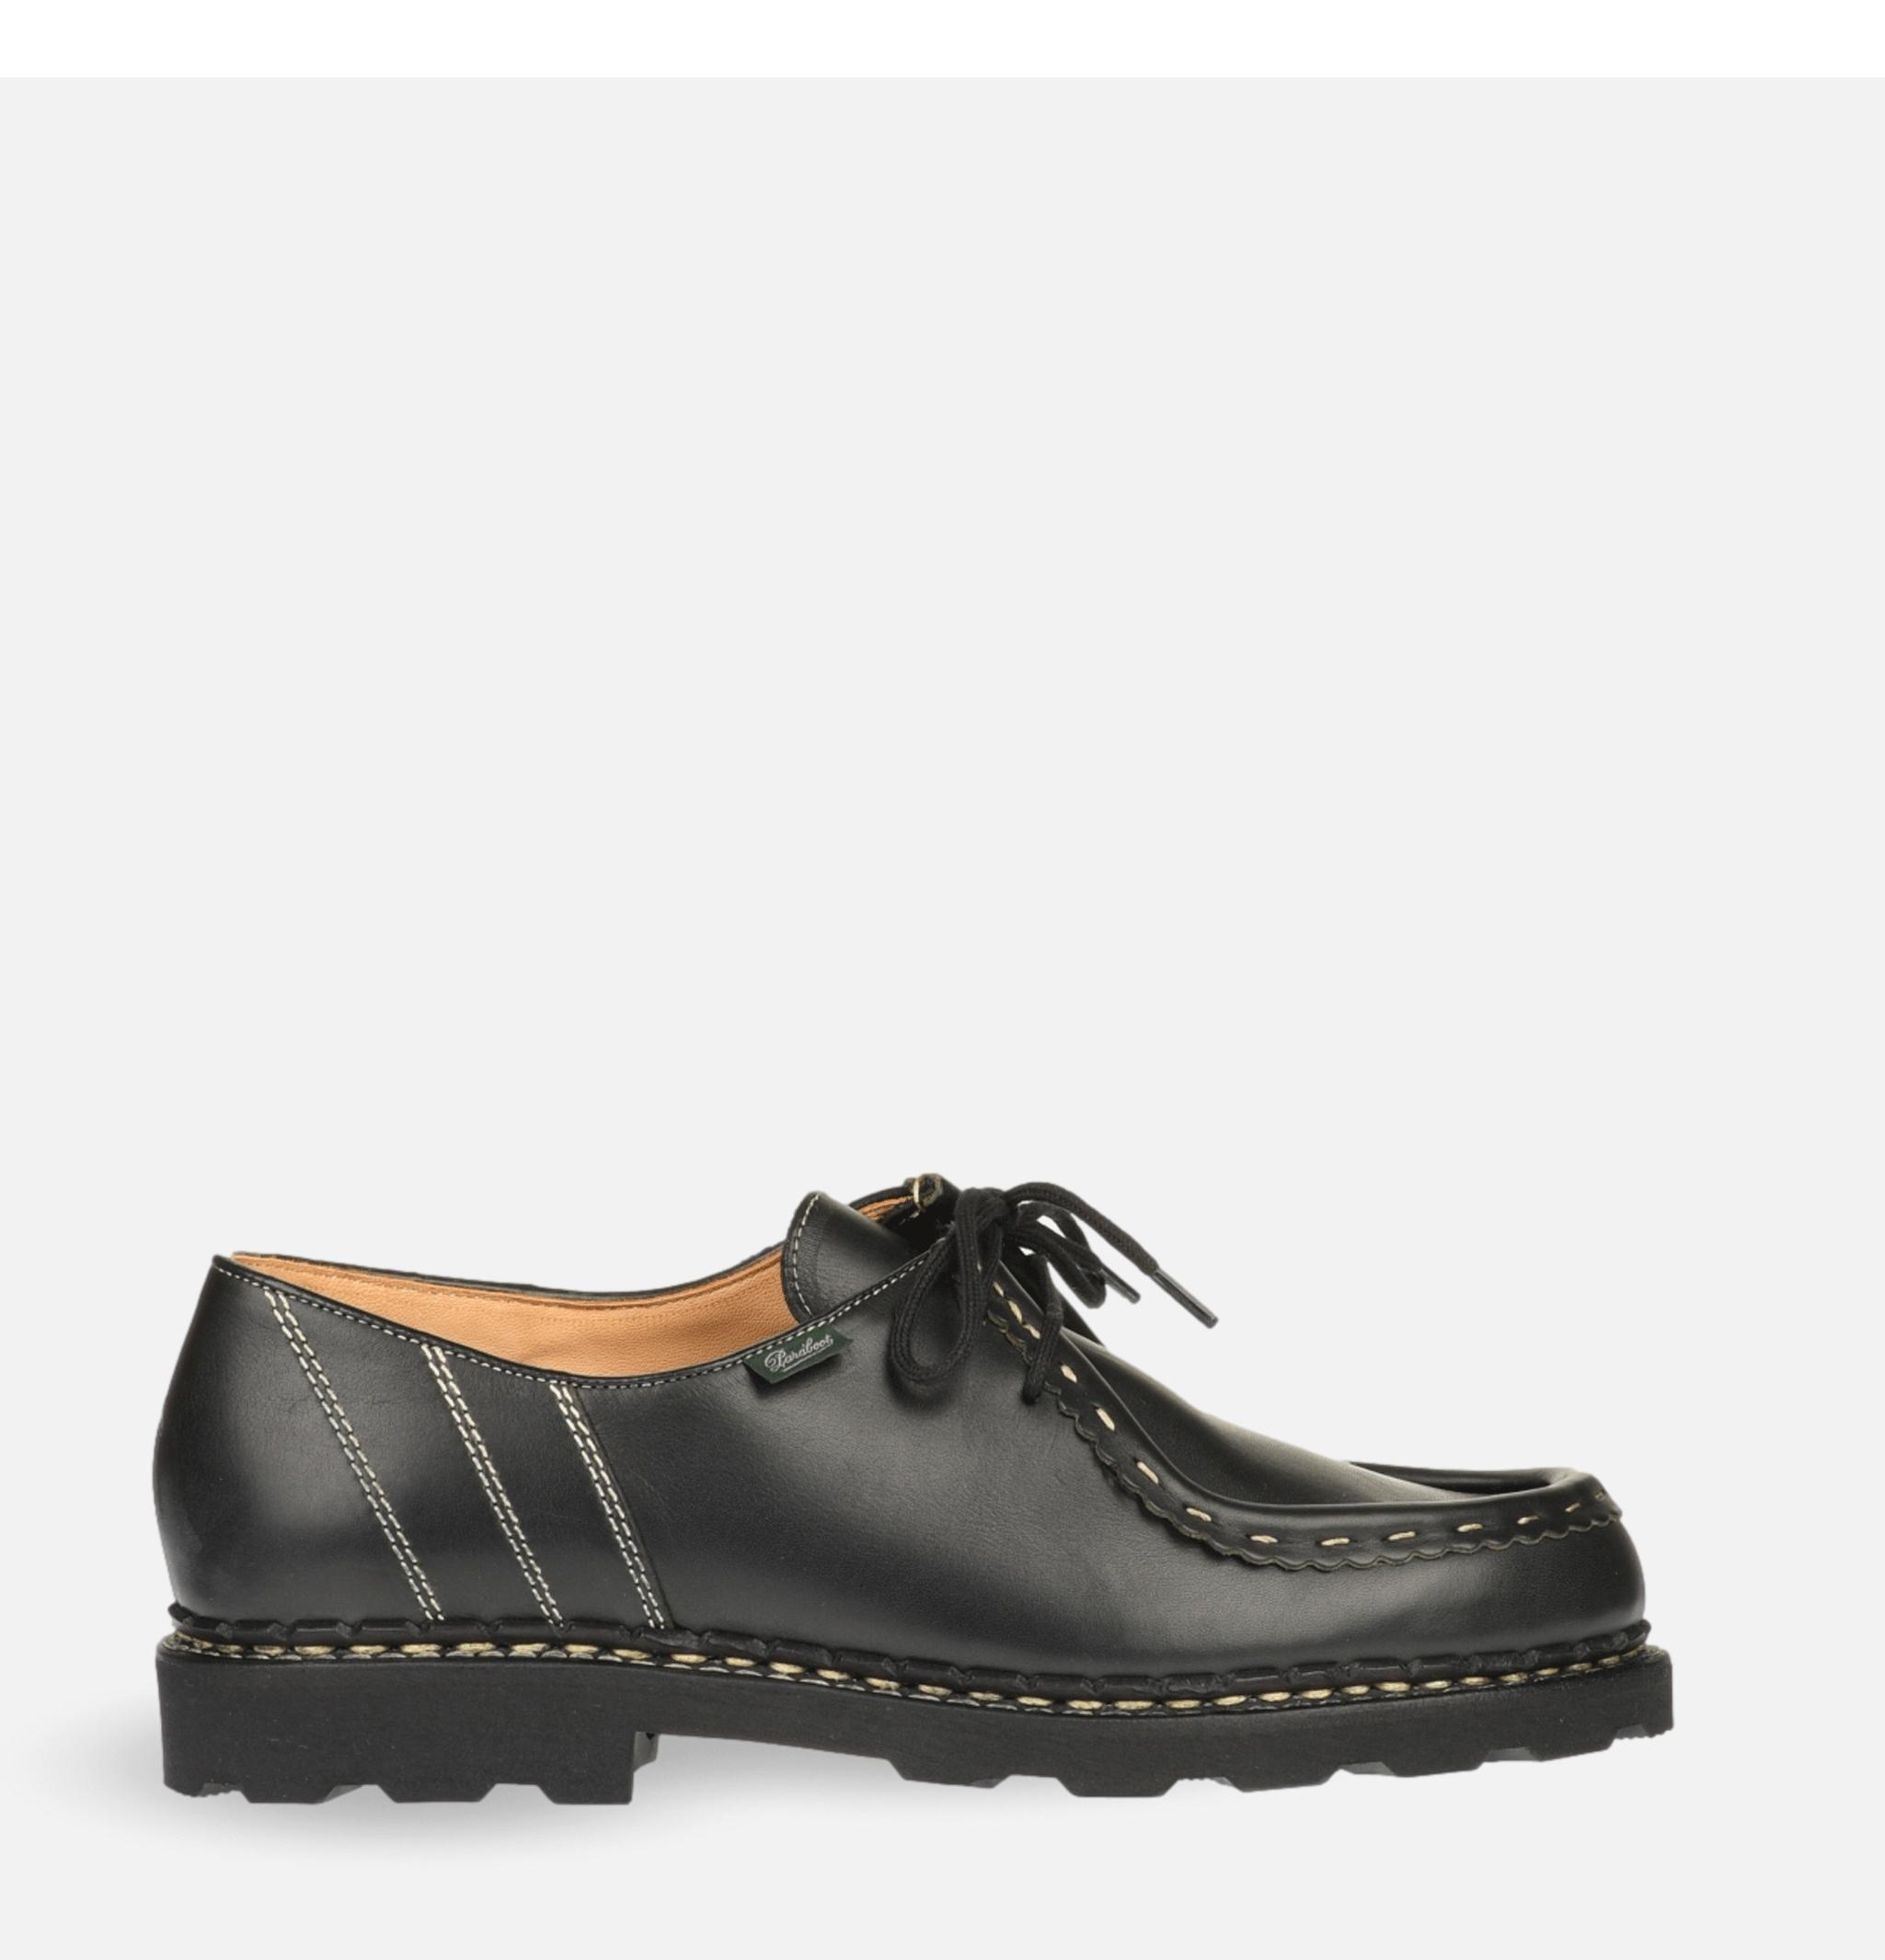 Morzine Shoes Black